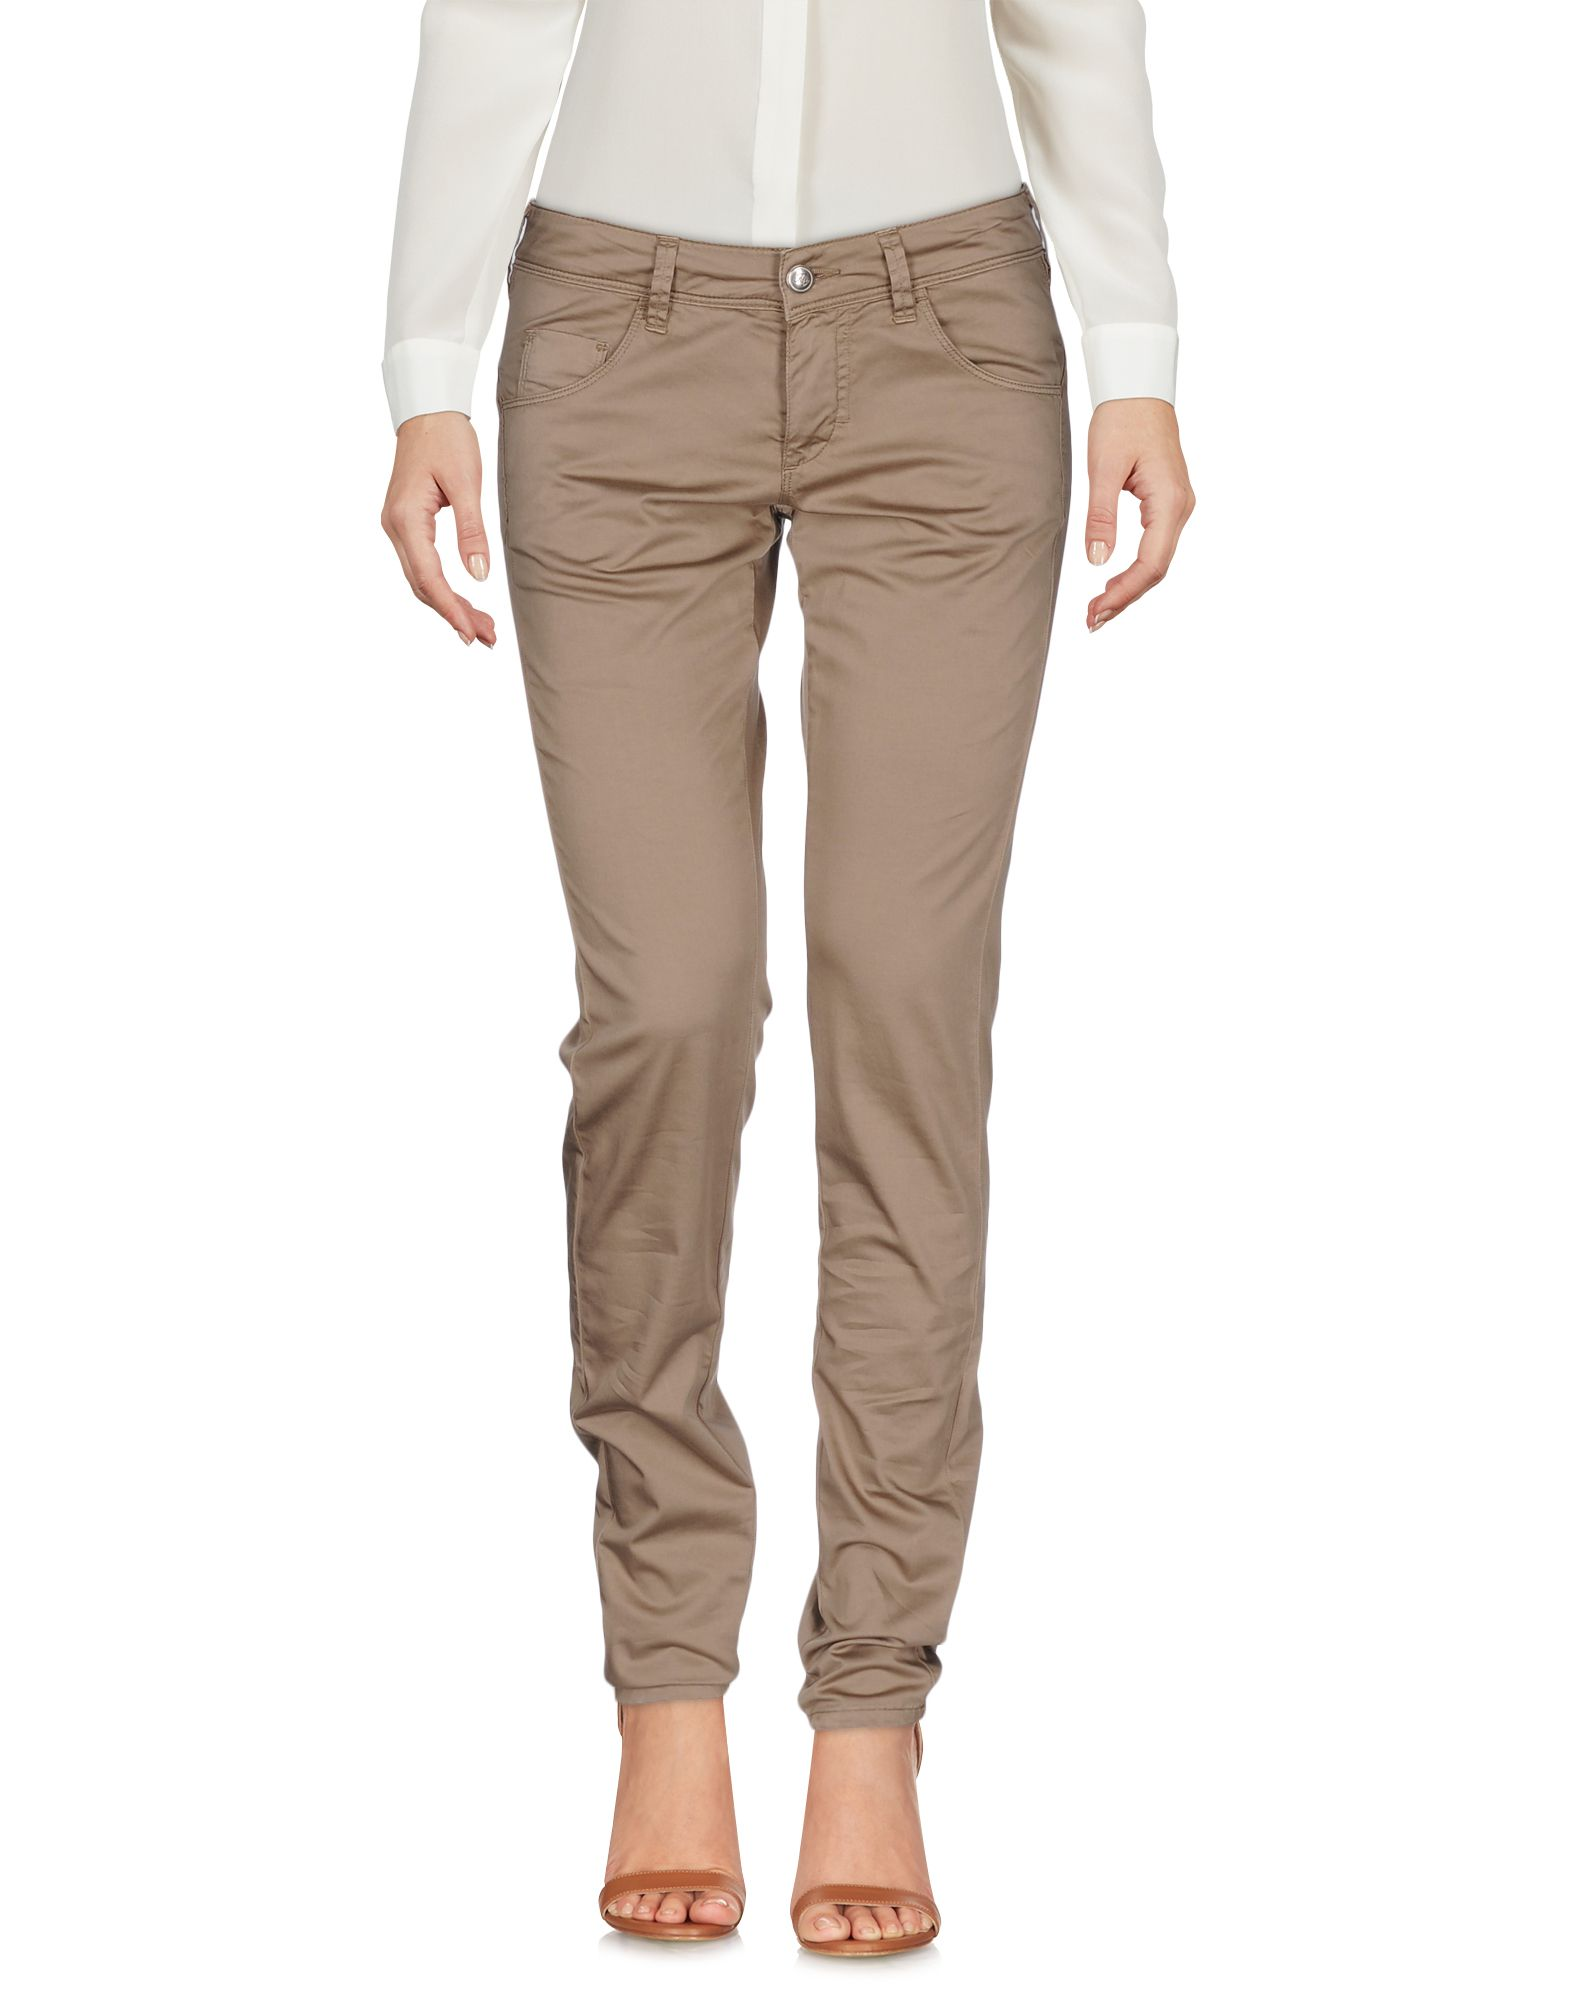 FAY Damen Hose Farbe Khaki Größe 8 - broschei